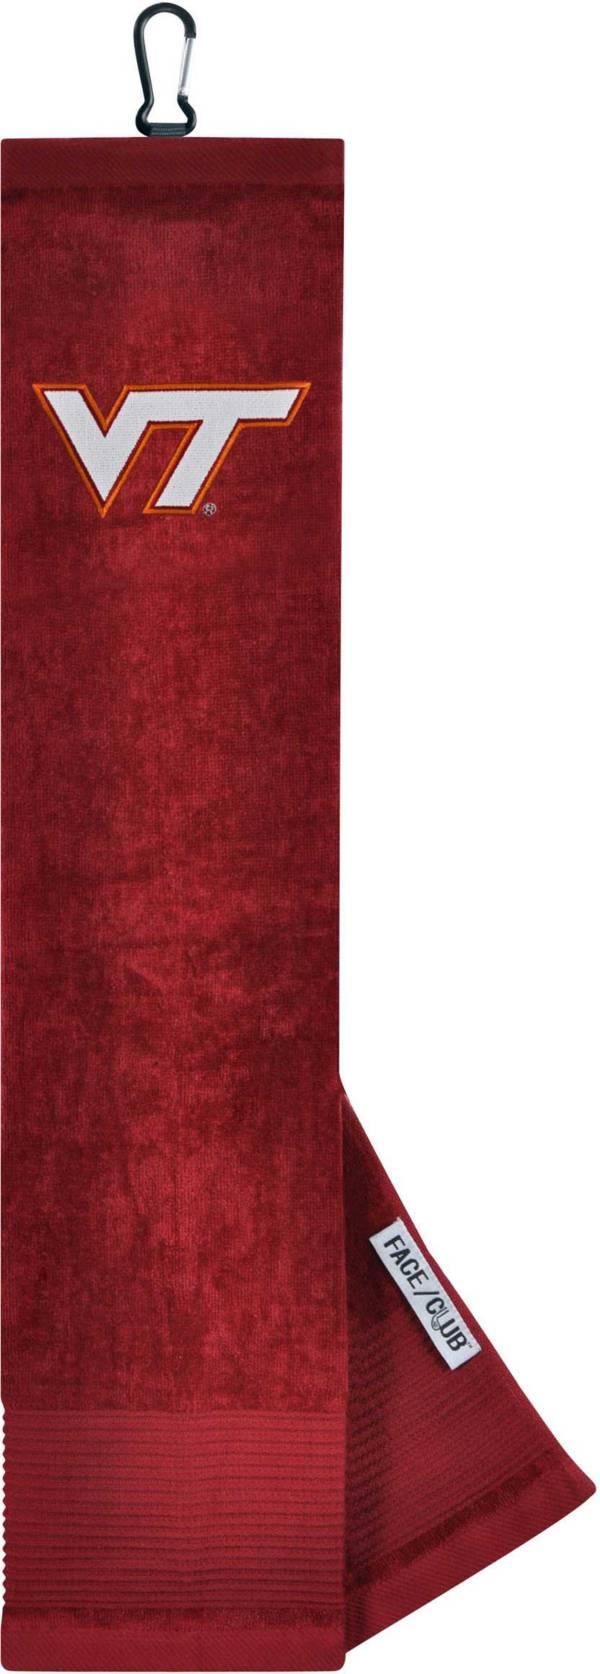 Team Effort Virginia Tech Hokies Embroidered Face/Club Tri-Fold Towel product image